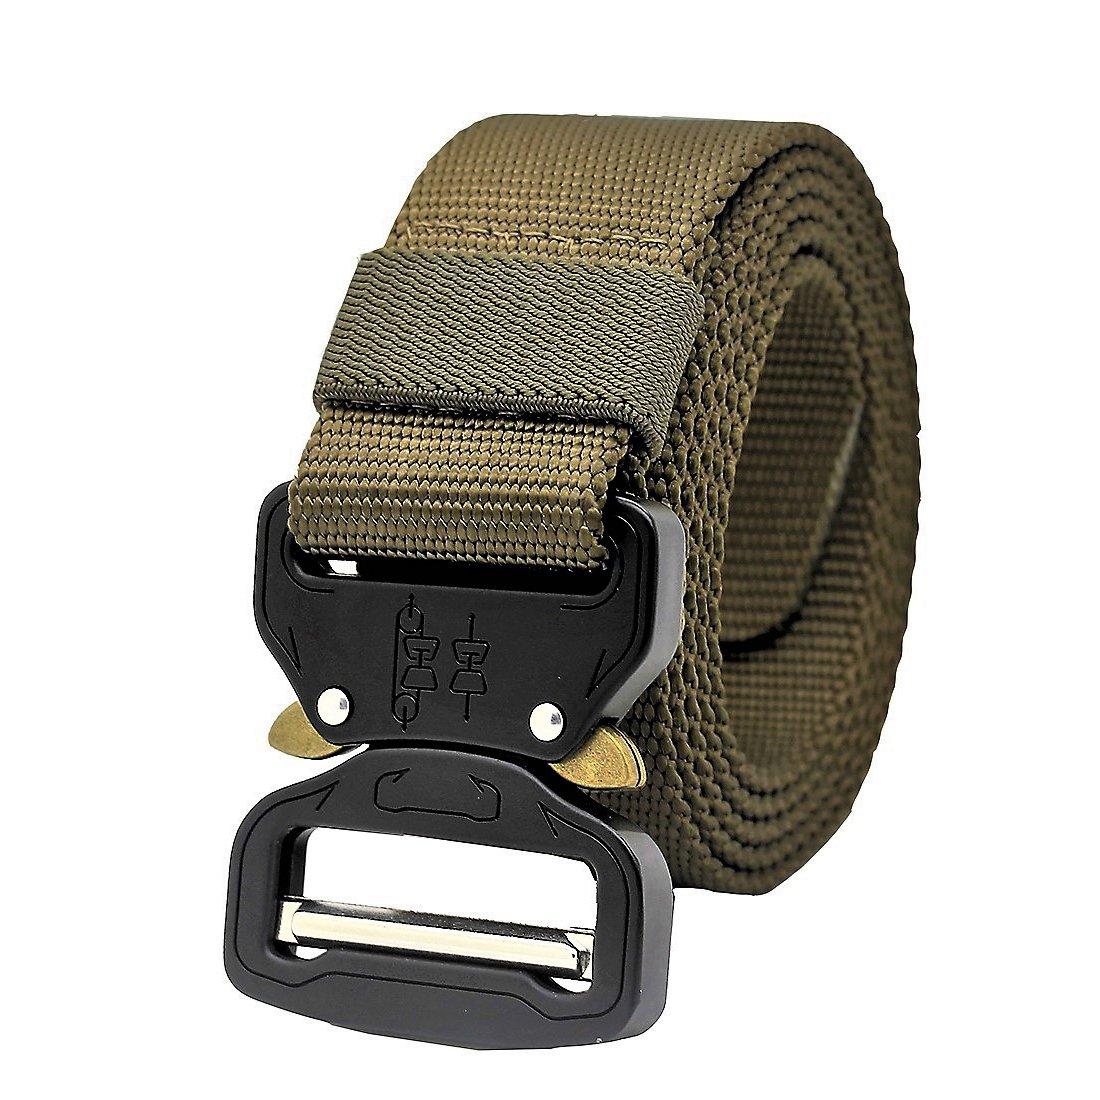 MOLLE Tactical Belt CQB Rigger Waistbelt Rappel Battle Adjustable Military Webbing Band Nylon Outdoor Heavy Duty Metal Buckle Mens EDC Belt (Black) GRULLIN